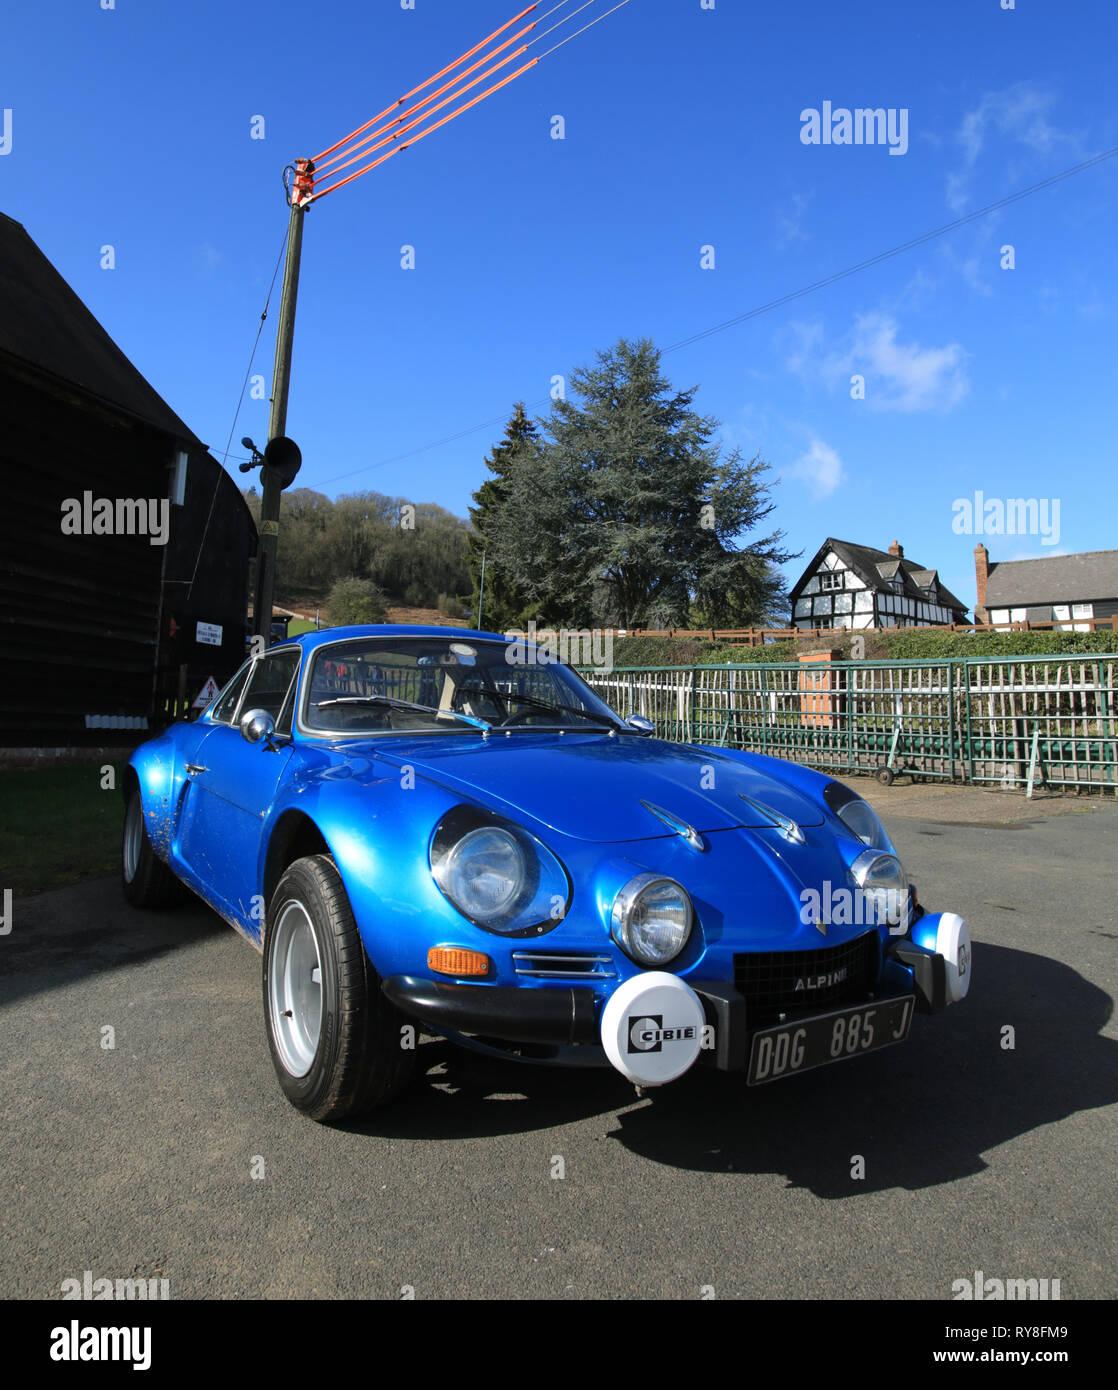 Alpine Renault Stock Photos & Alpine Renault Stock Images